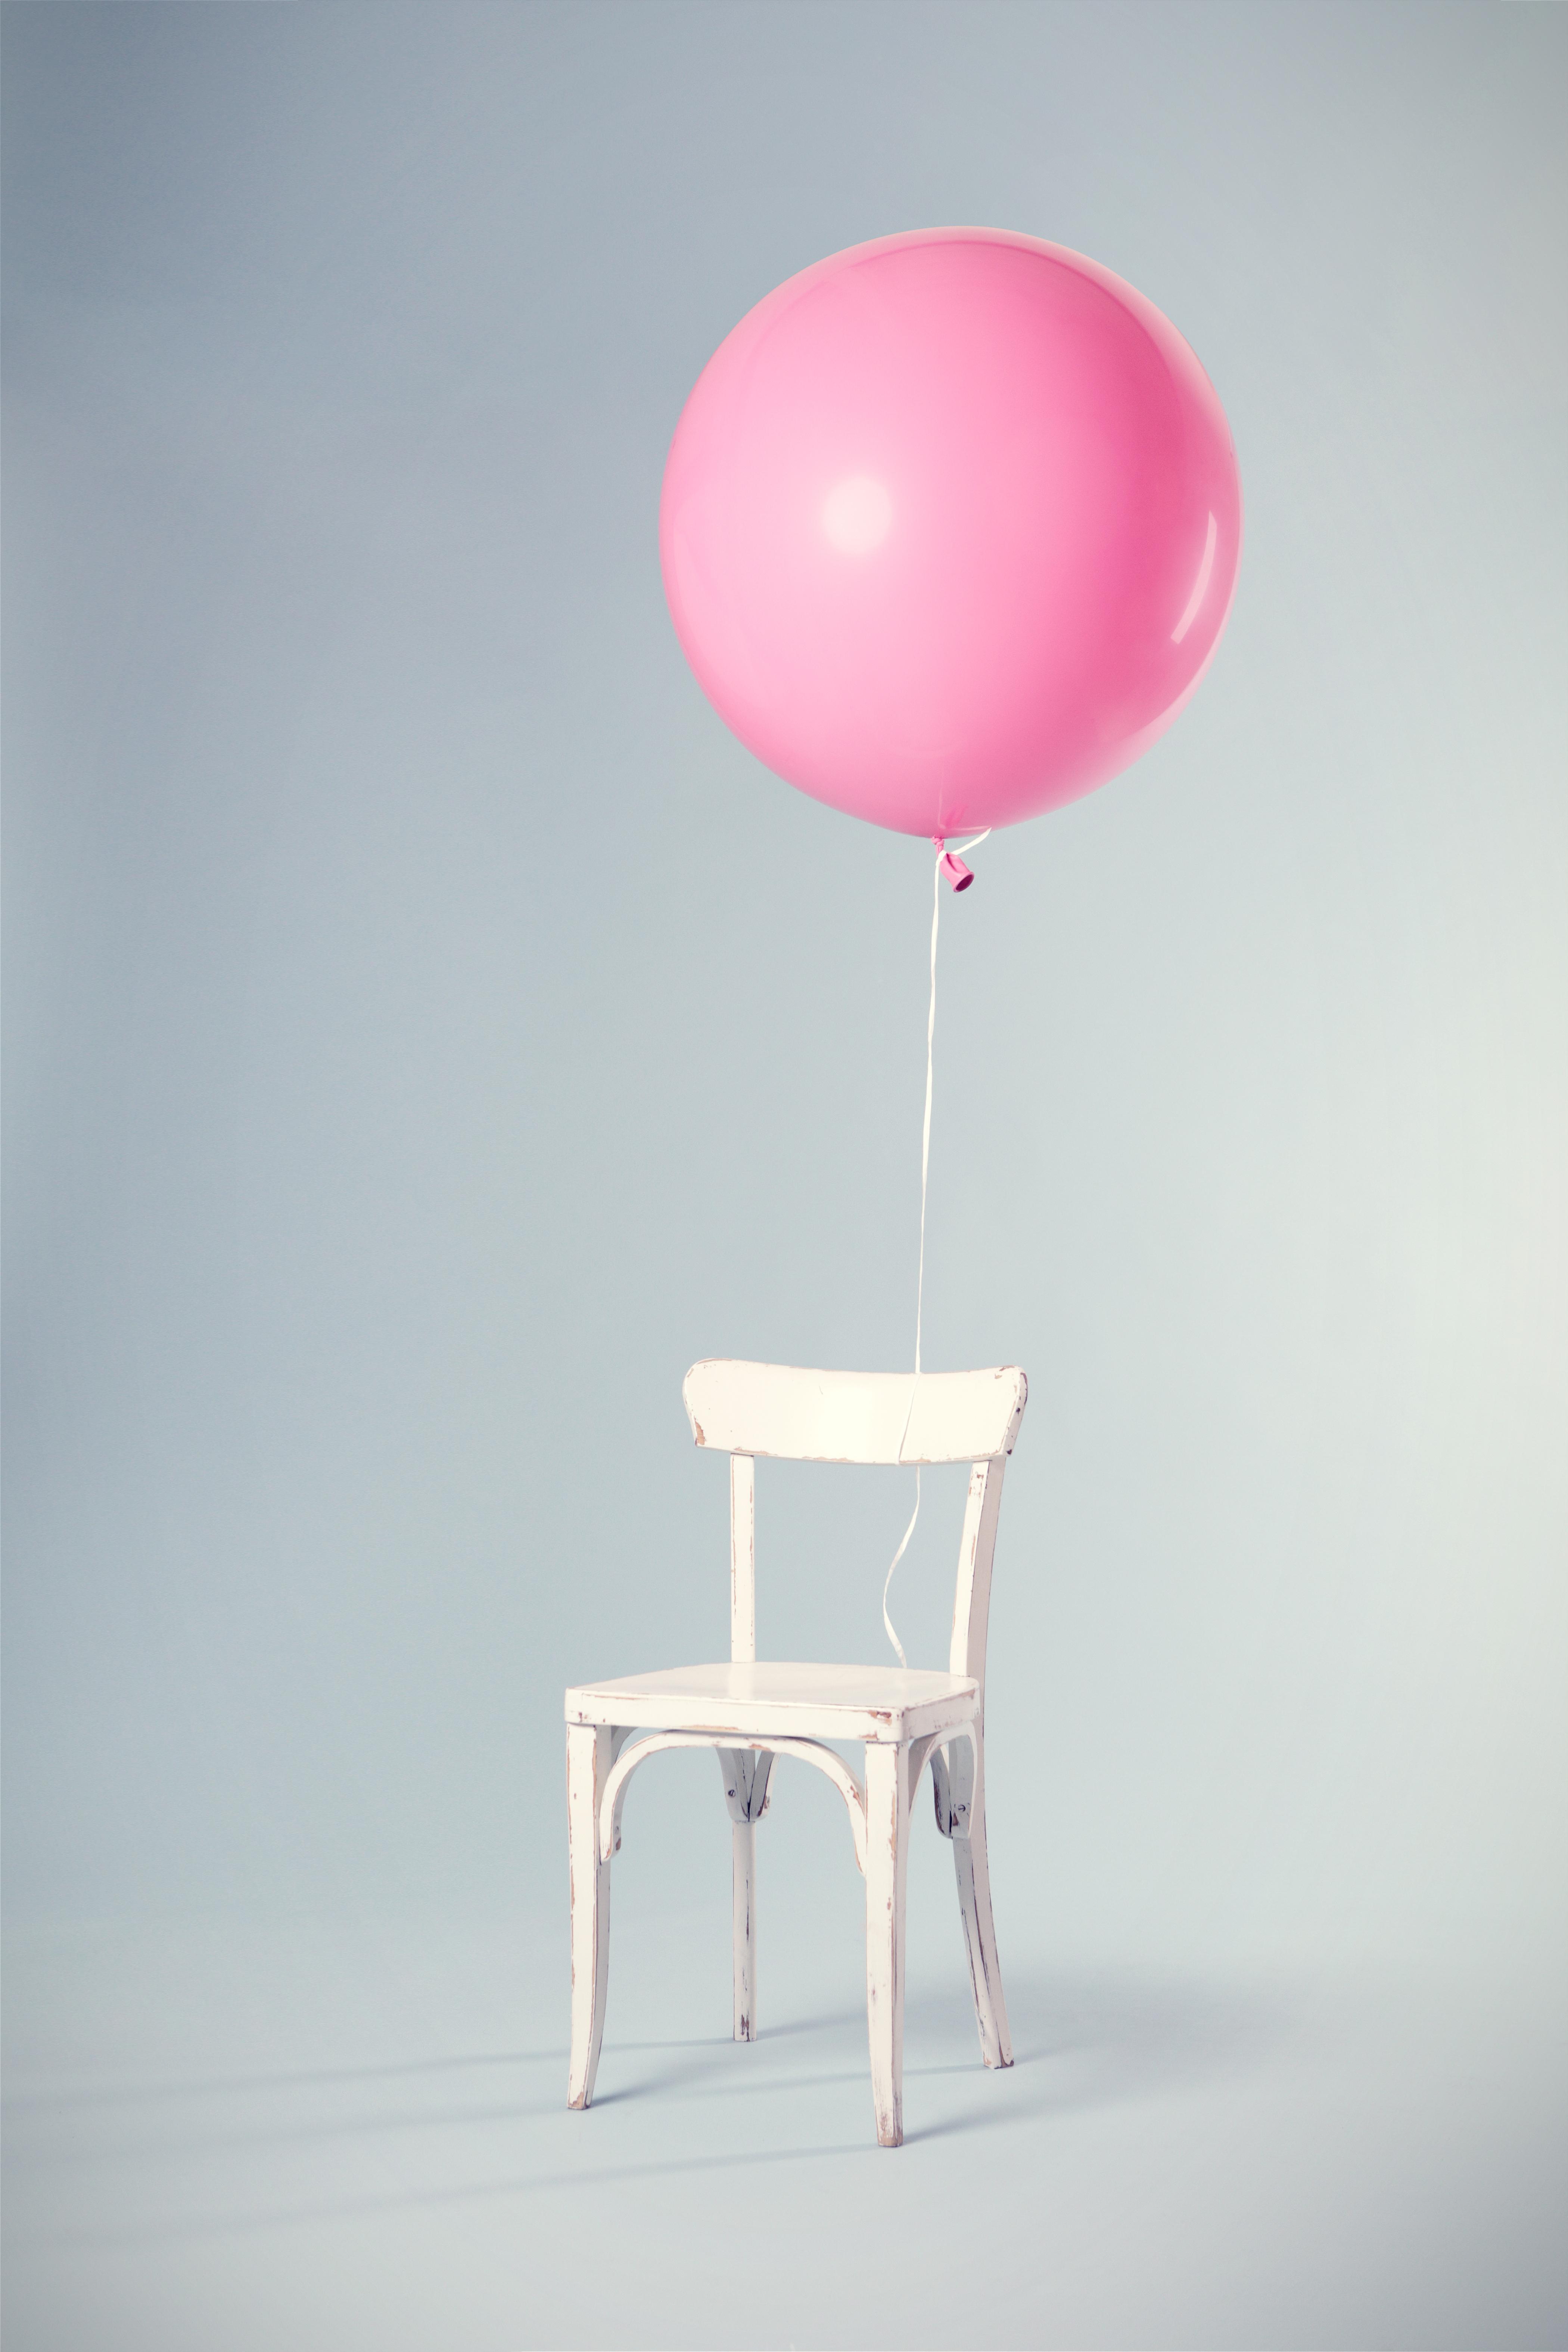 chaise avec un ballon rose